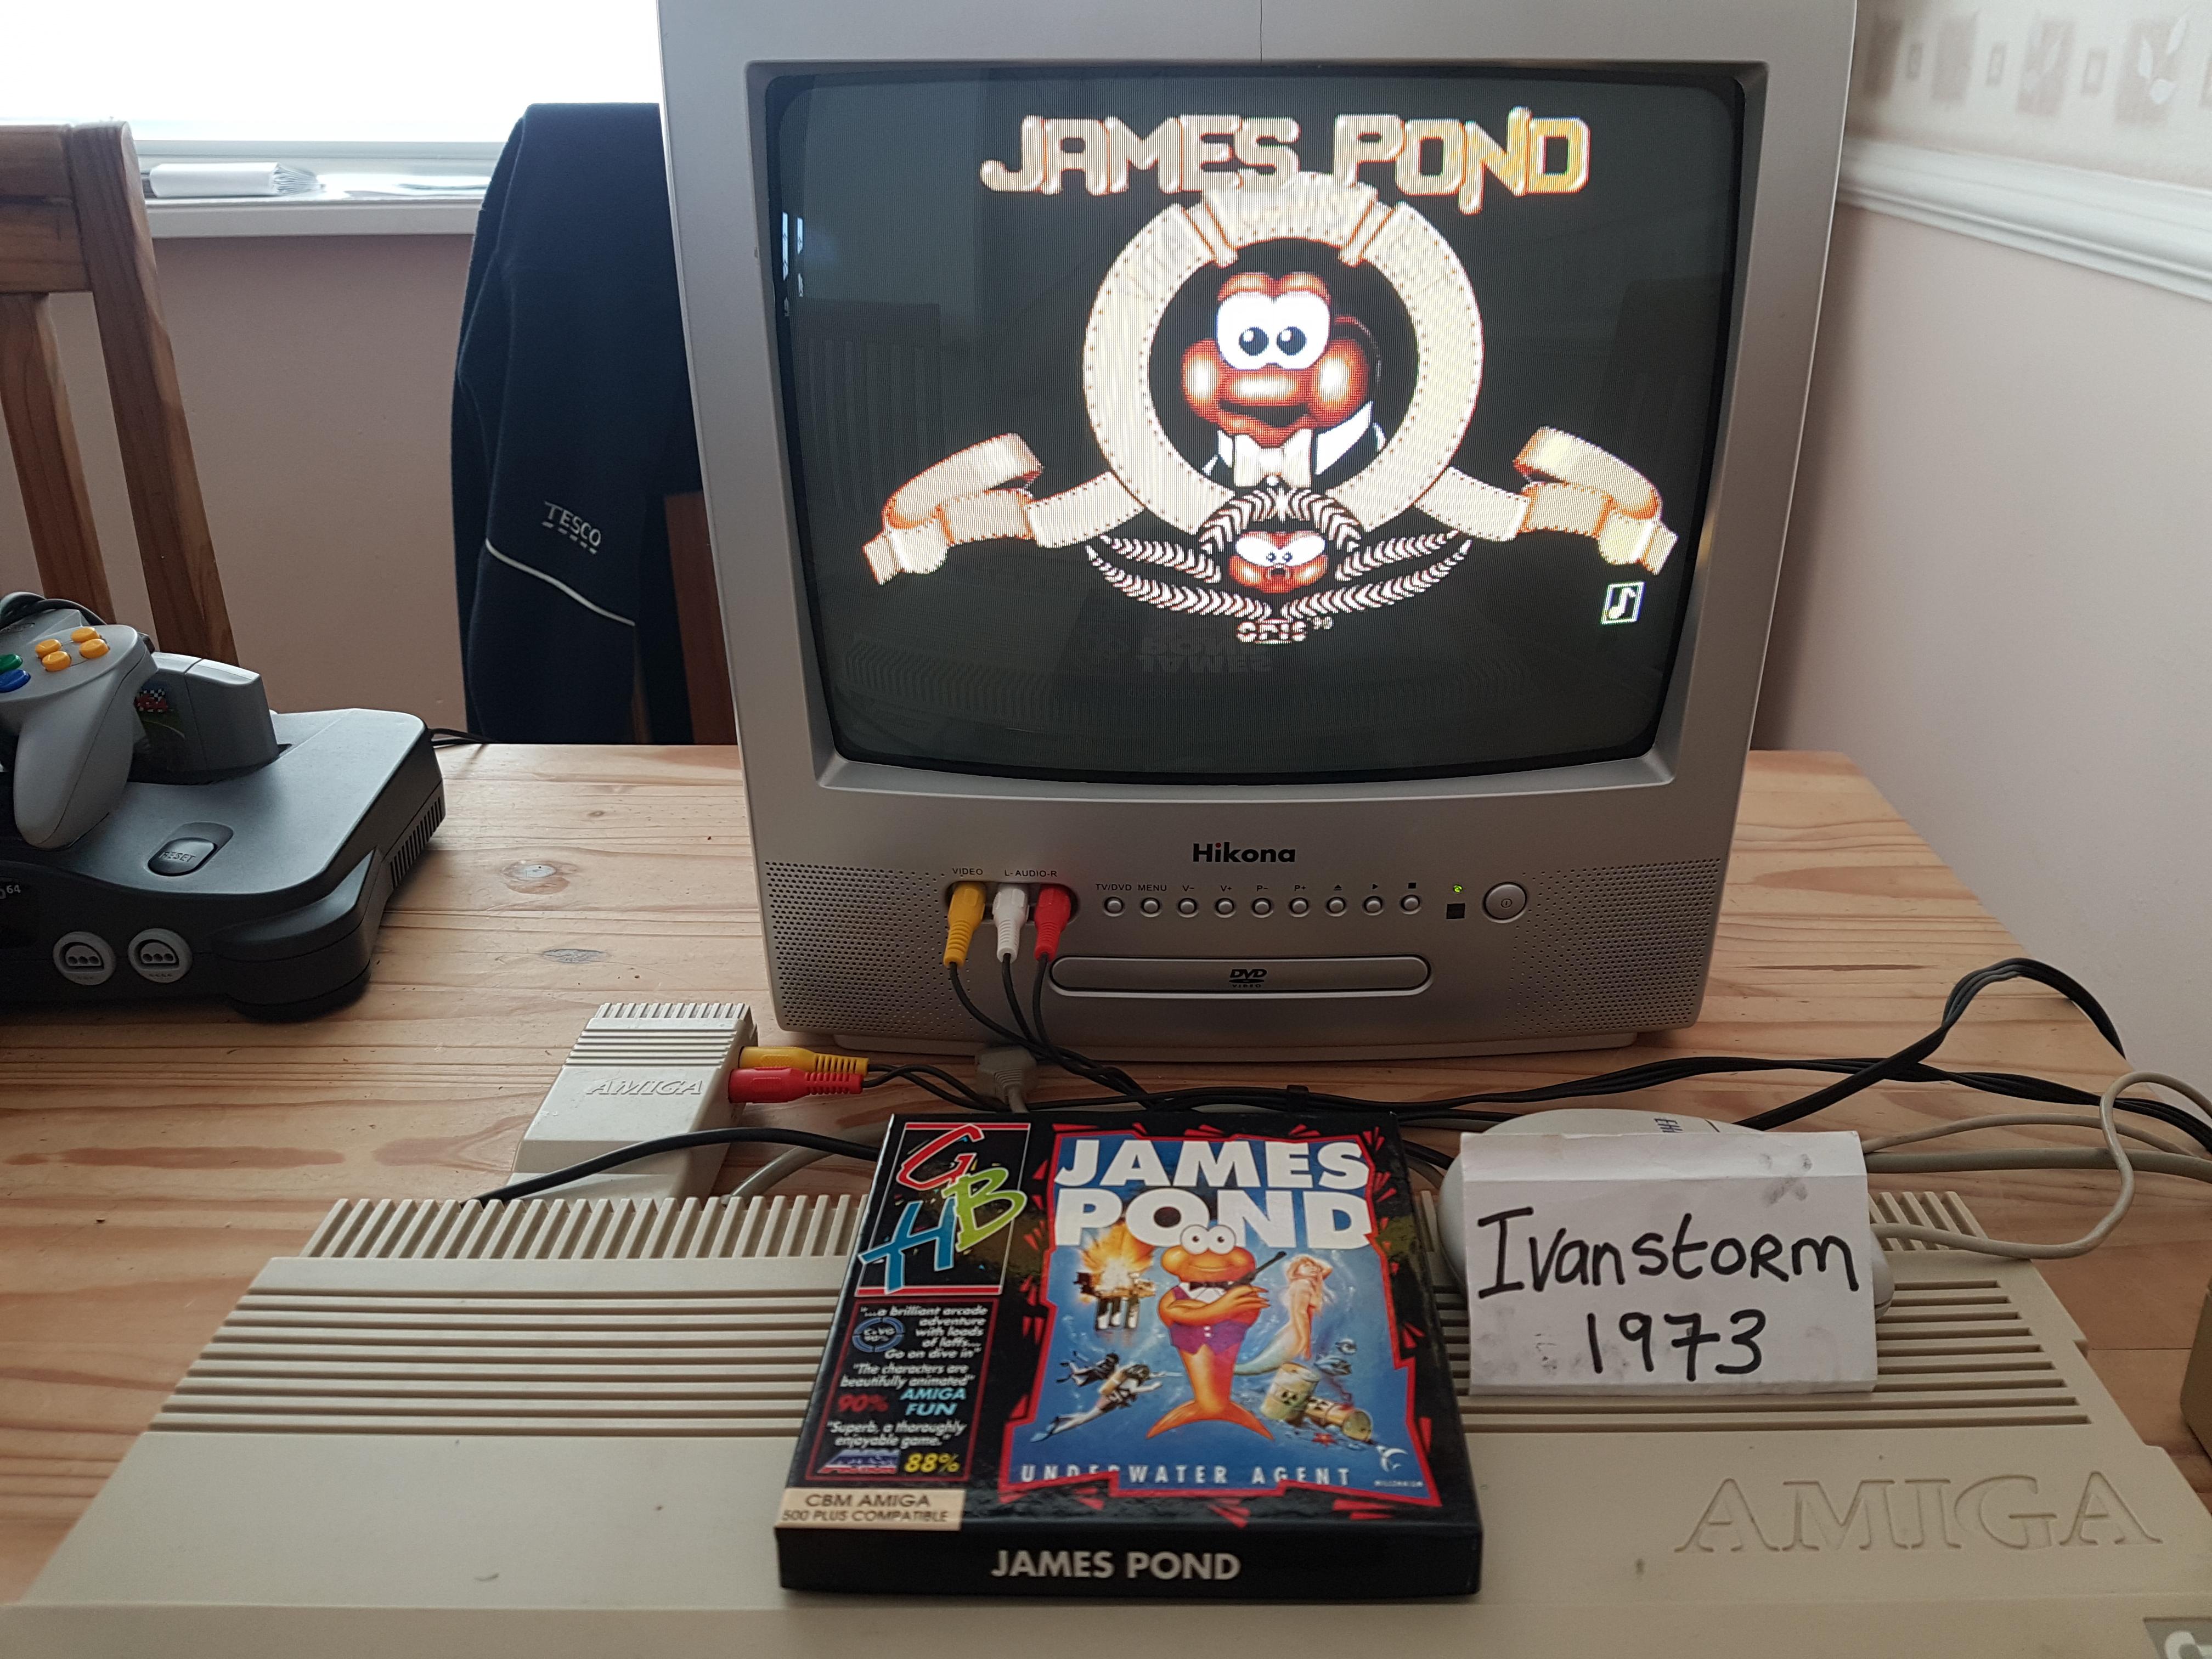 Ivanstorm1973: James Pond: Underwater Agent (Amiga) 2,359,000 points on 2018-03-25 11:34:08